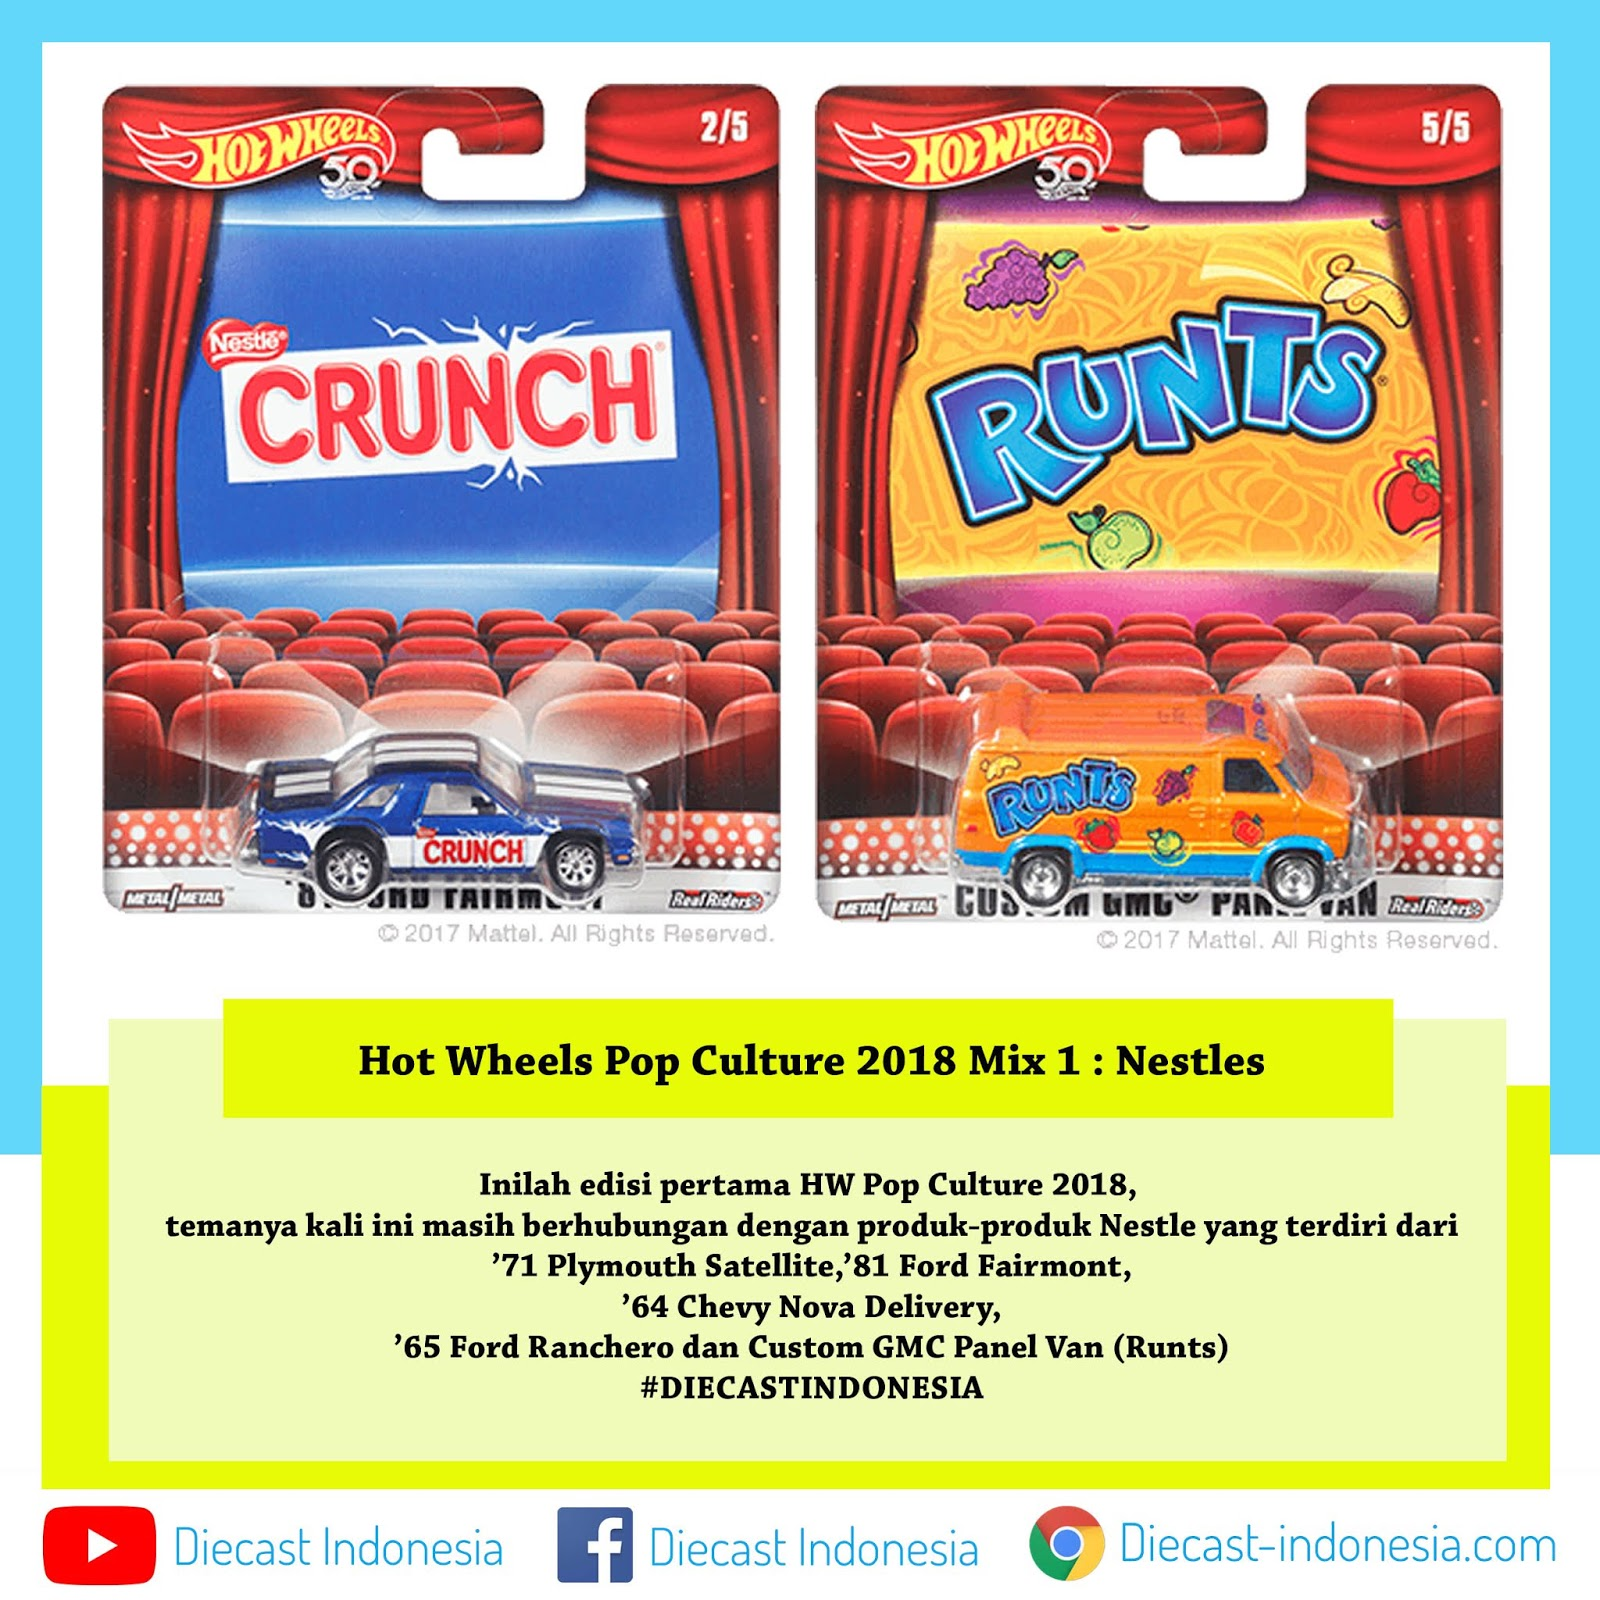 Hot Wheels Pop Culture 2018 Mix 1 : Nestles  Diecast Indonesia